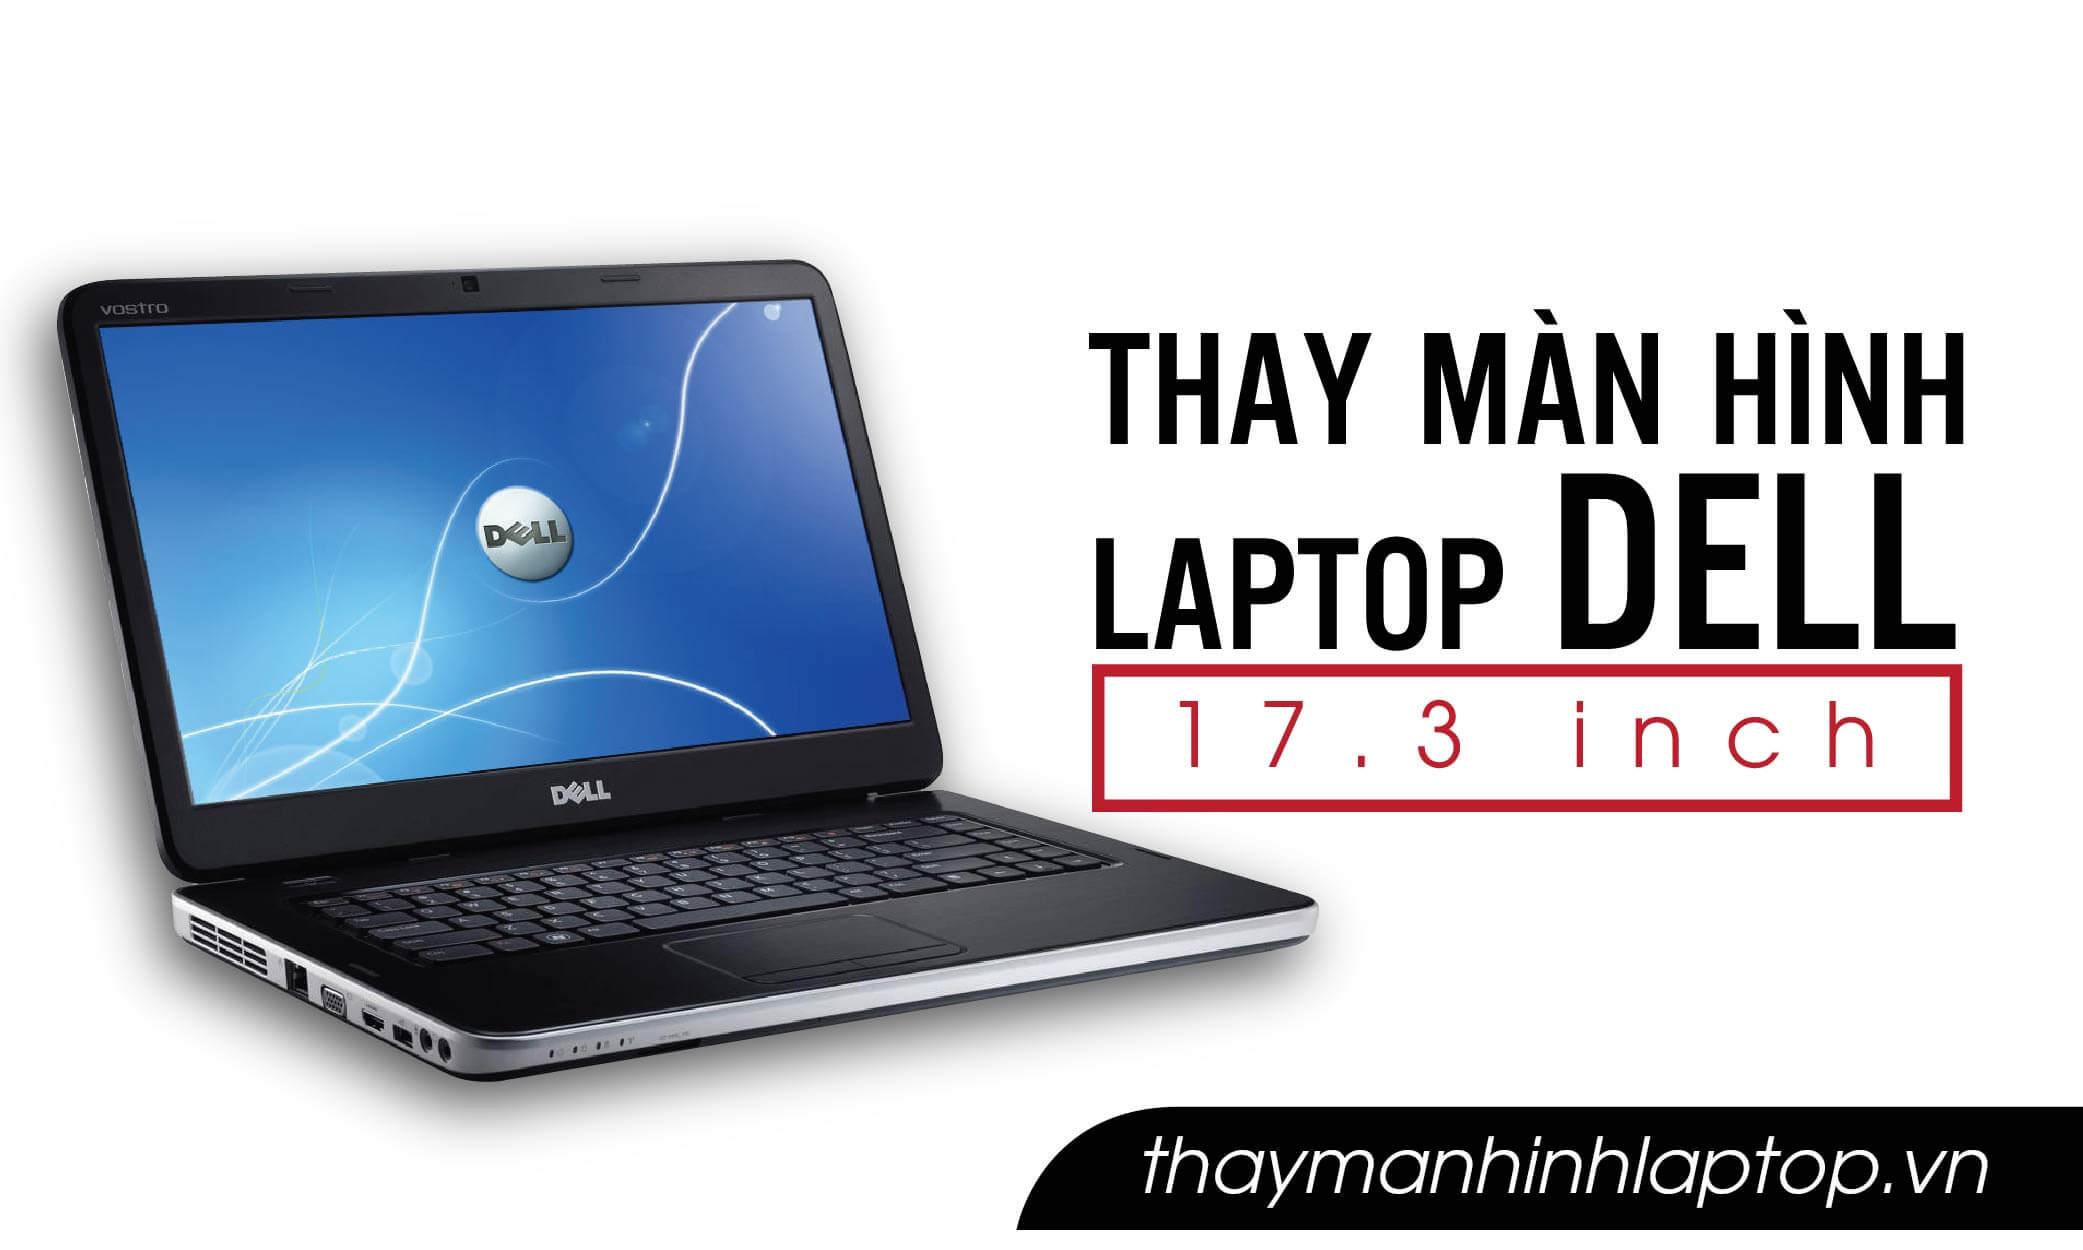 thay-man-hinh-laptop-dell-17-3-inch